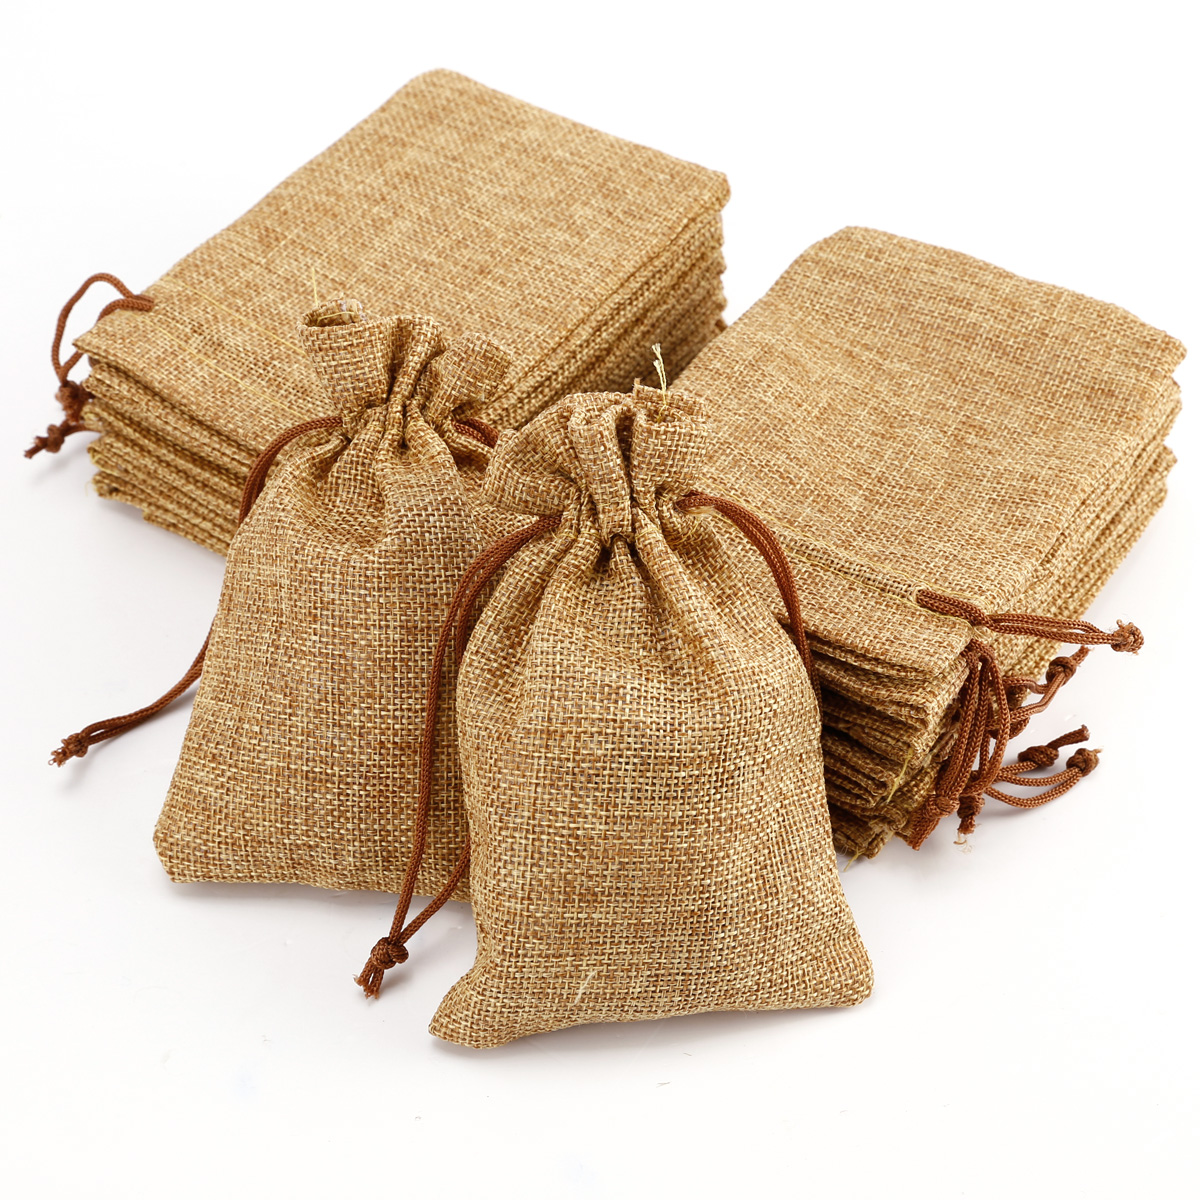 20 natural burlap bags jute hessian drawstring sack small wedding favor gift ebay. Black Bedroom Furniture Sets. Home Design Ideas